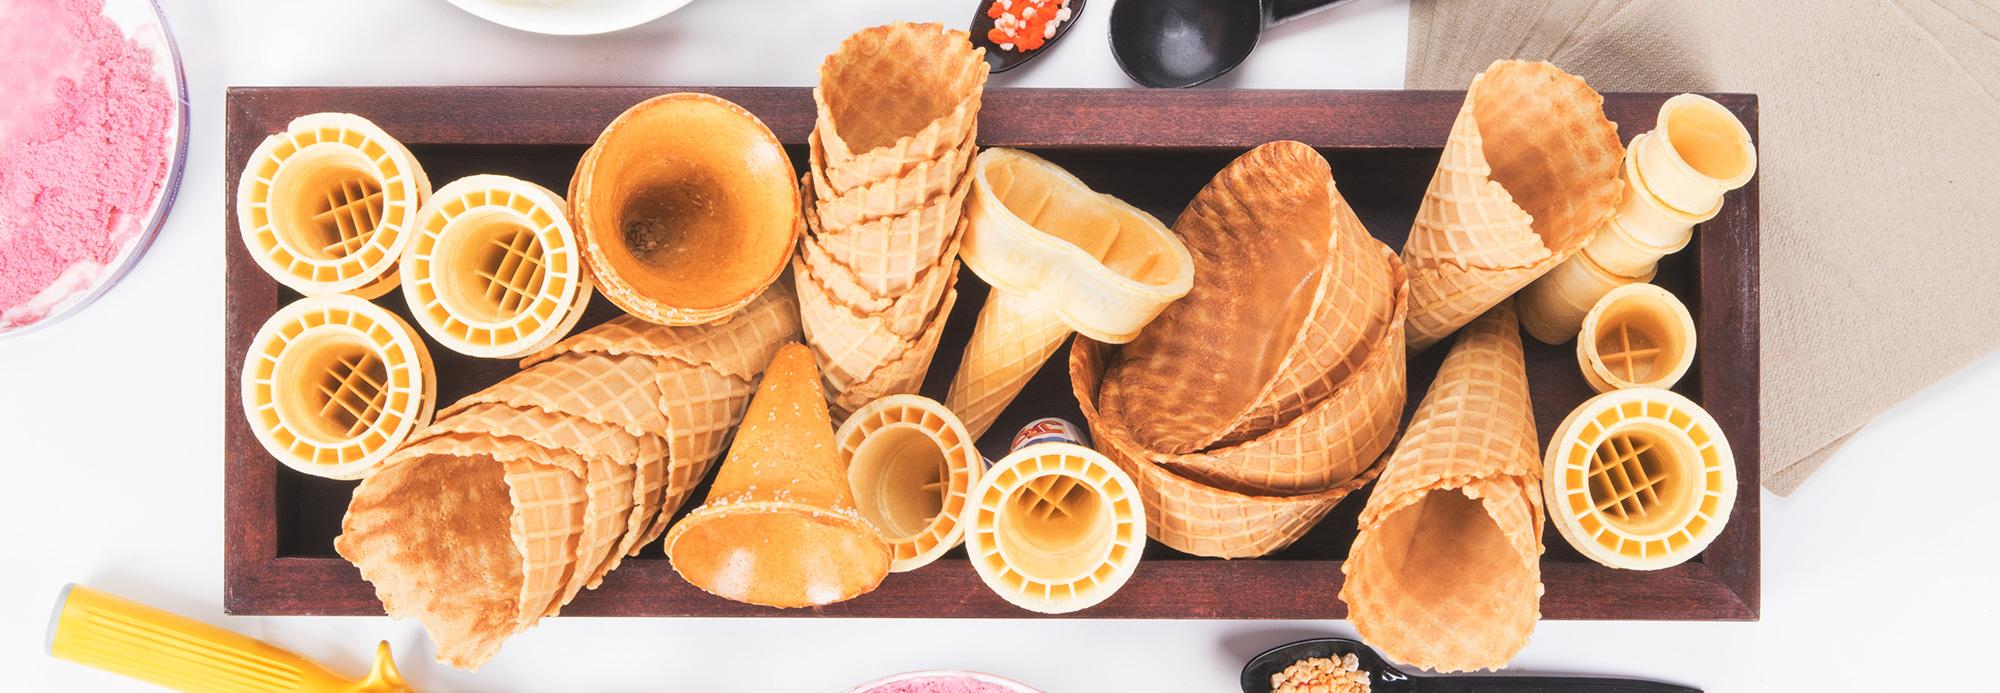 Kinds Ice Cream Cones